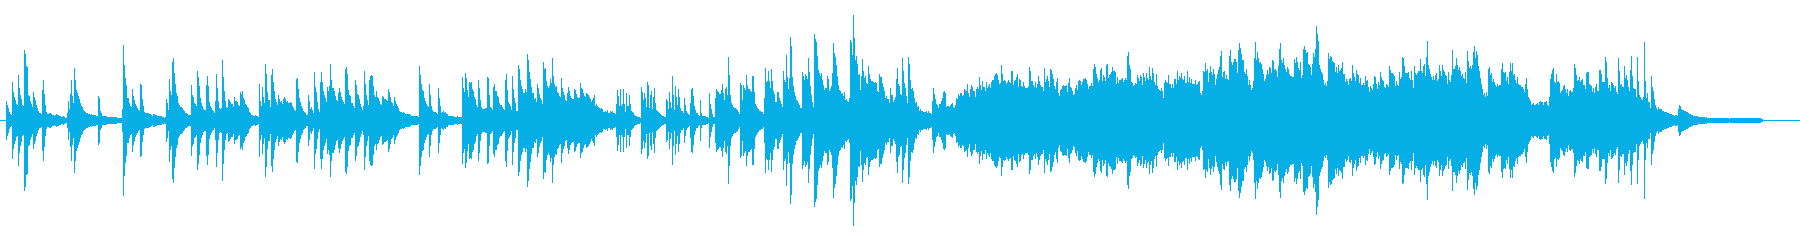 REMEMBRANCEの再生済みの波形